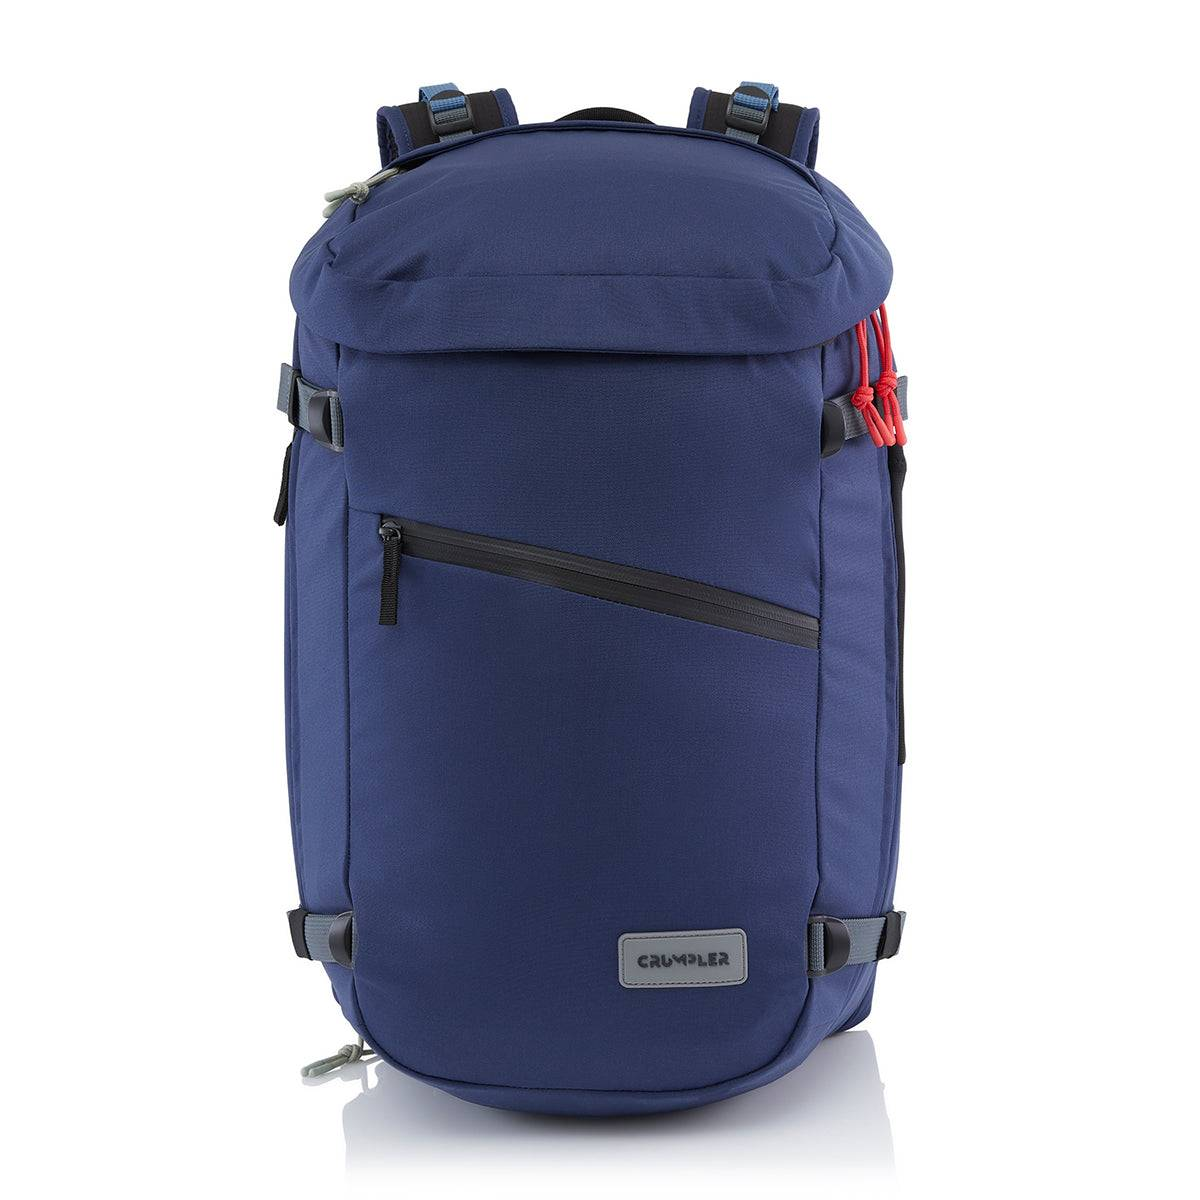 Crumpler Jolly Swagman Travel Backpack nightsky 47 L